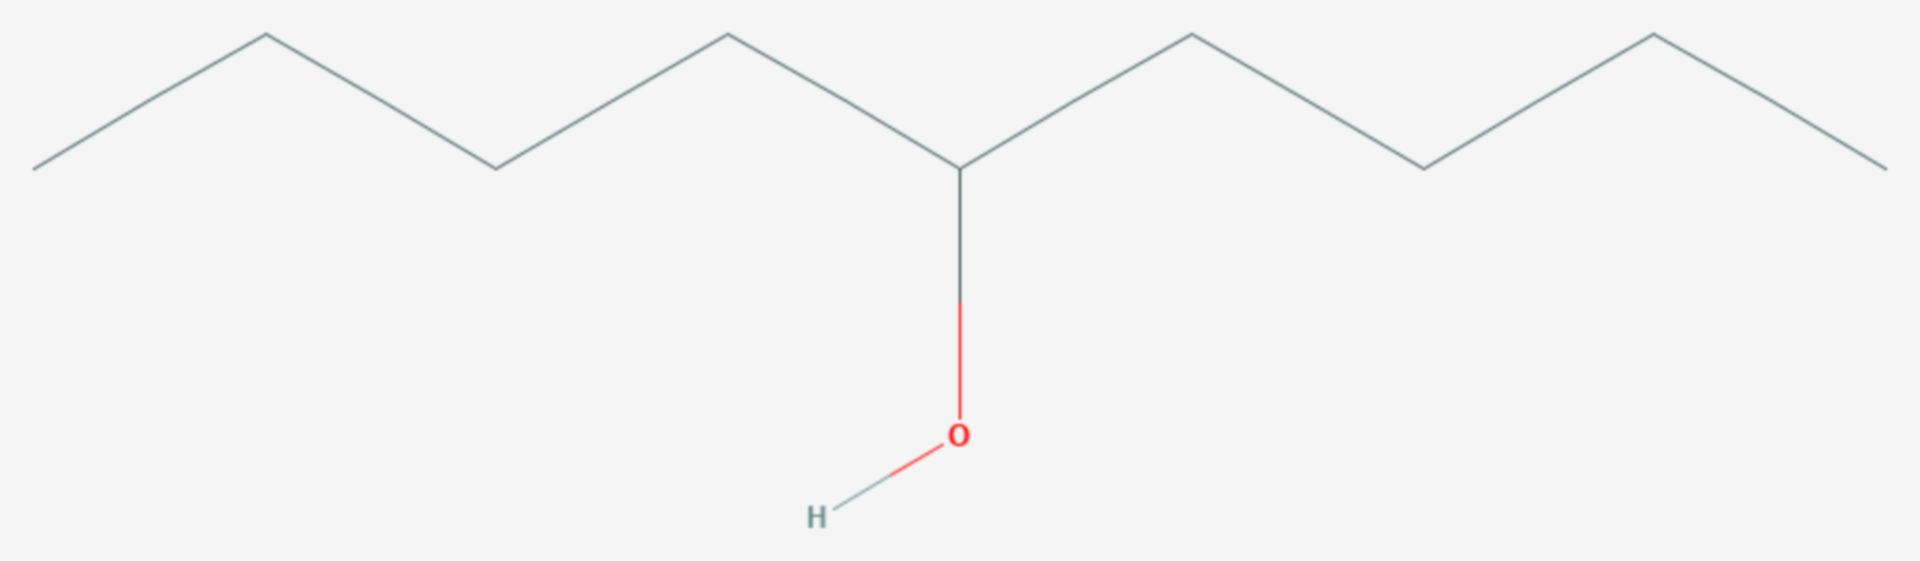 5-Nonanol (Strukturformel)